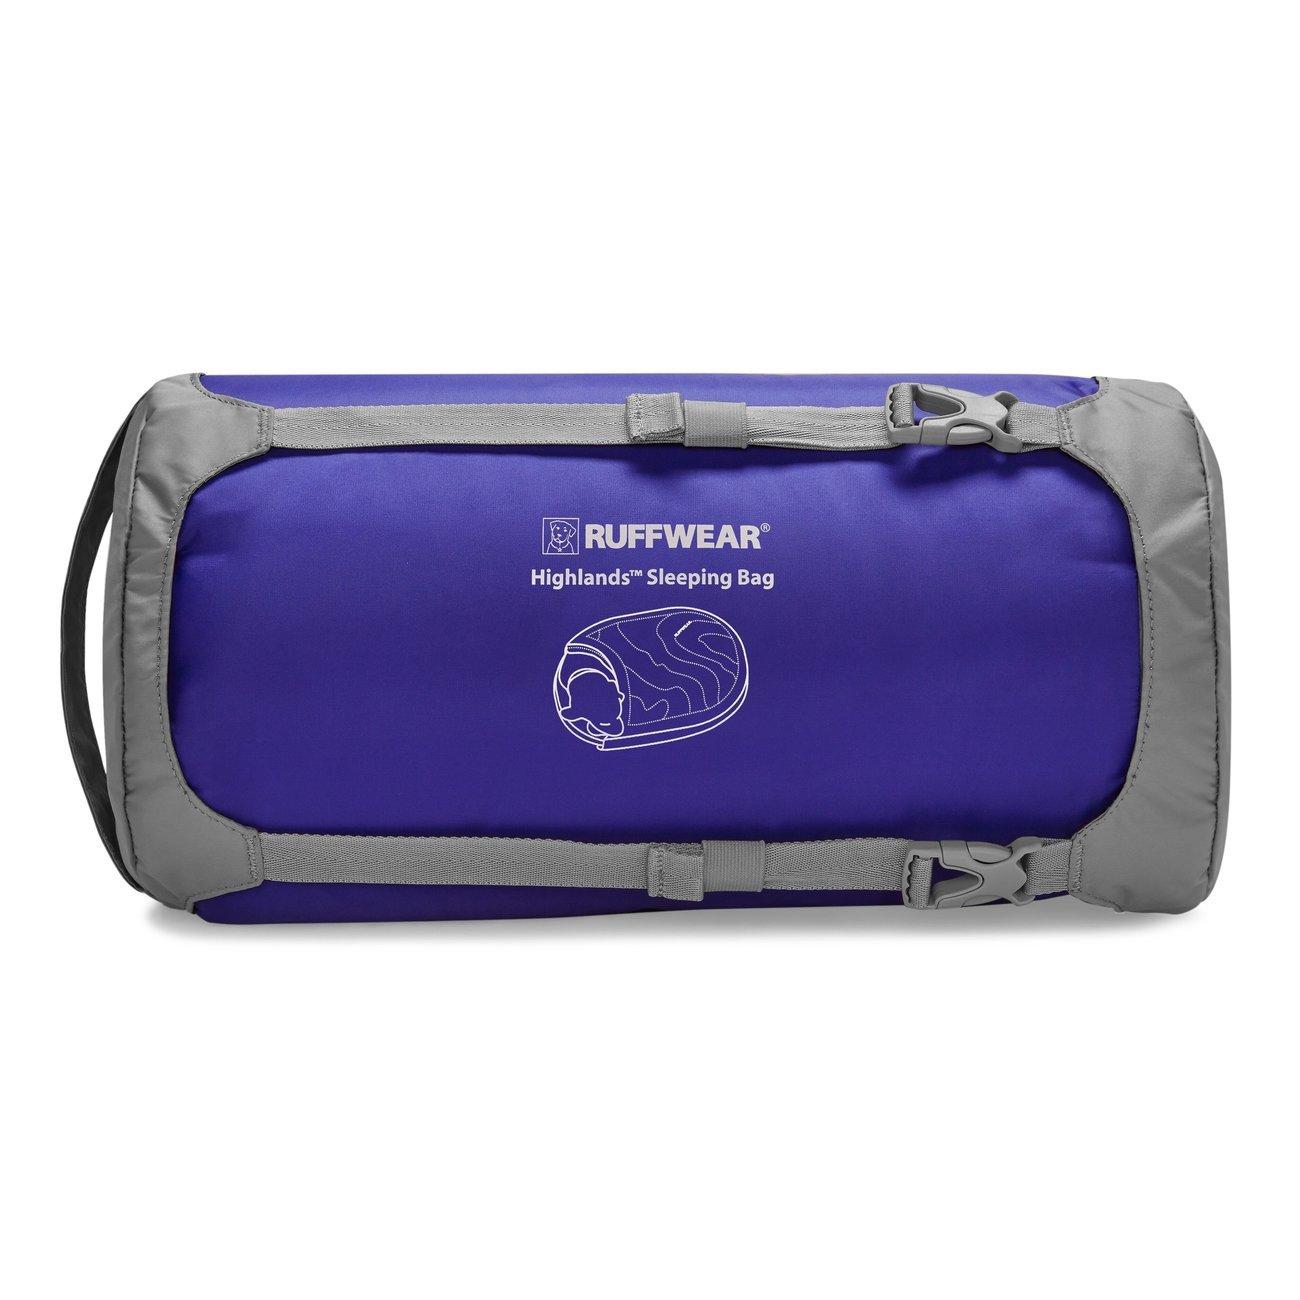 Ruffwear Highlands Sleeping Bag™ Schlafsack für Hunde, Bild 19